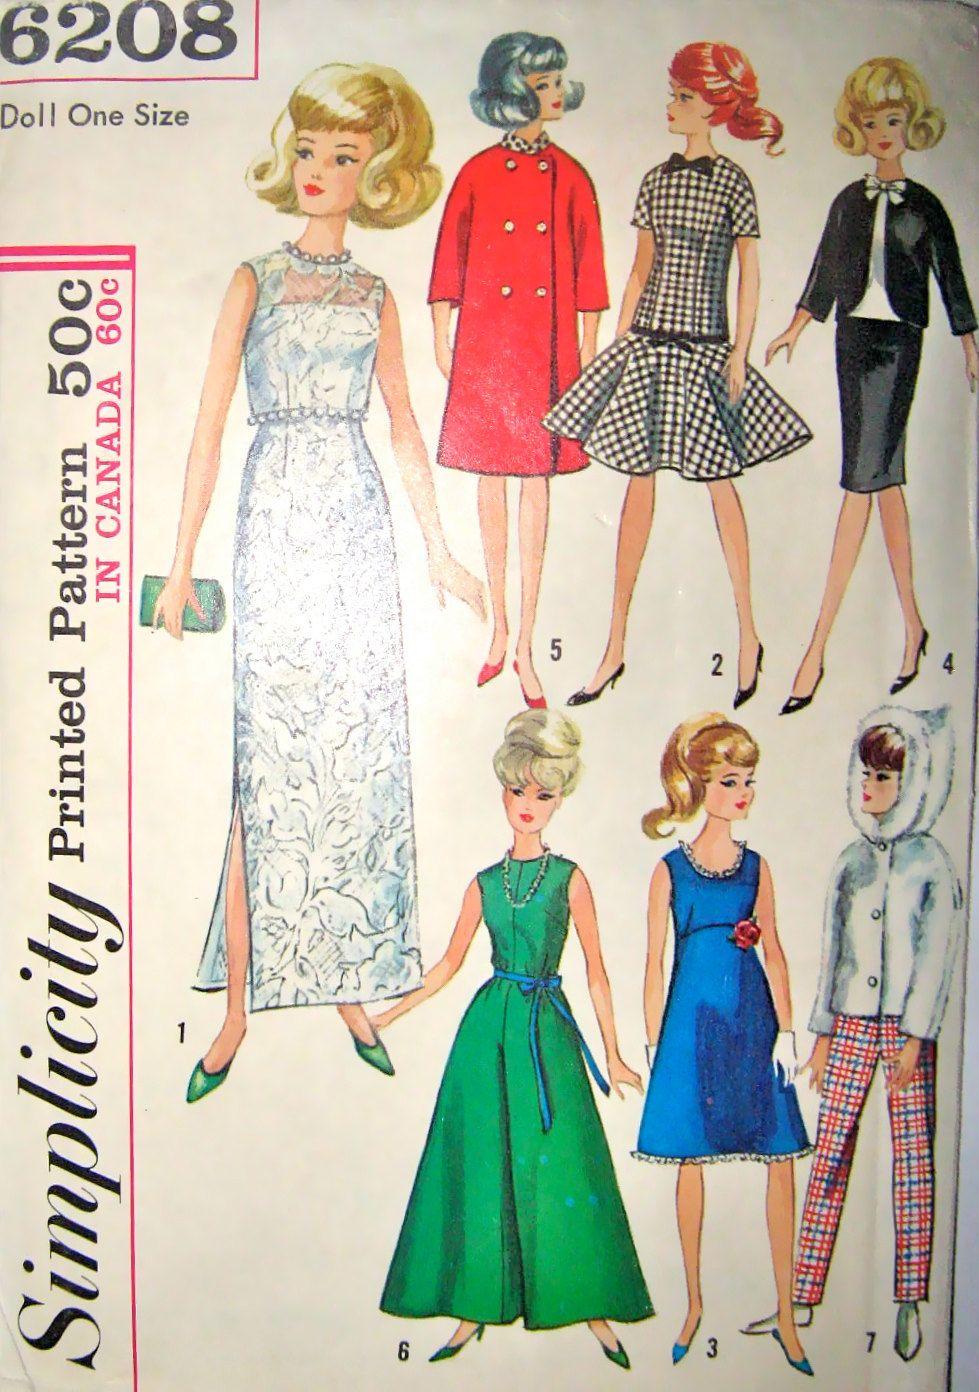 60s Barbie Dolls Wardrobe Simplicity 6208 Vintage Pattern,. $8.95 ...